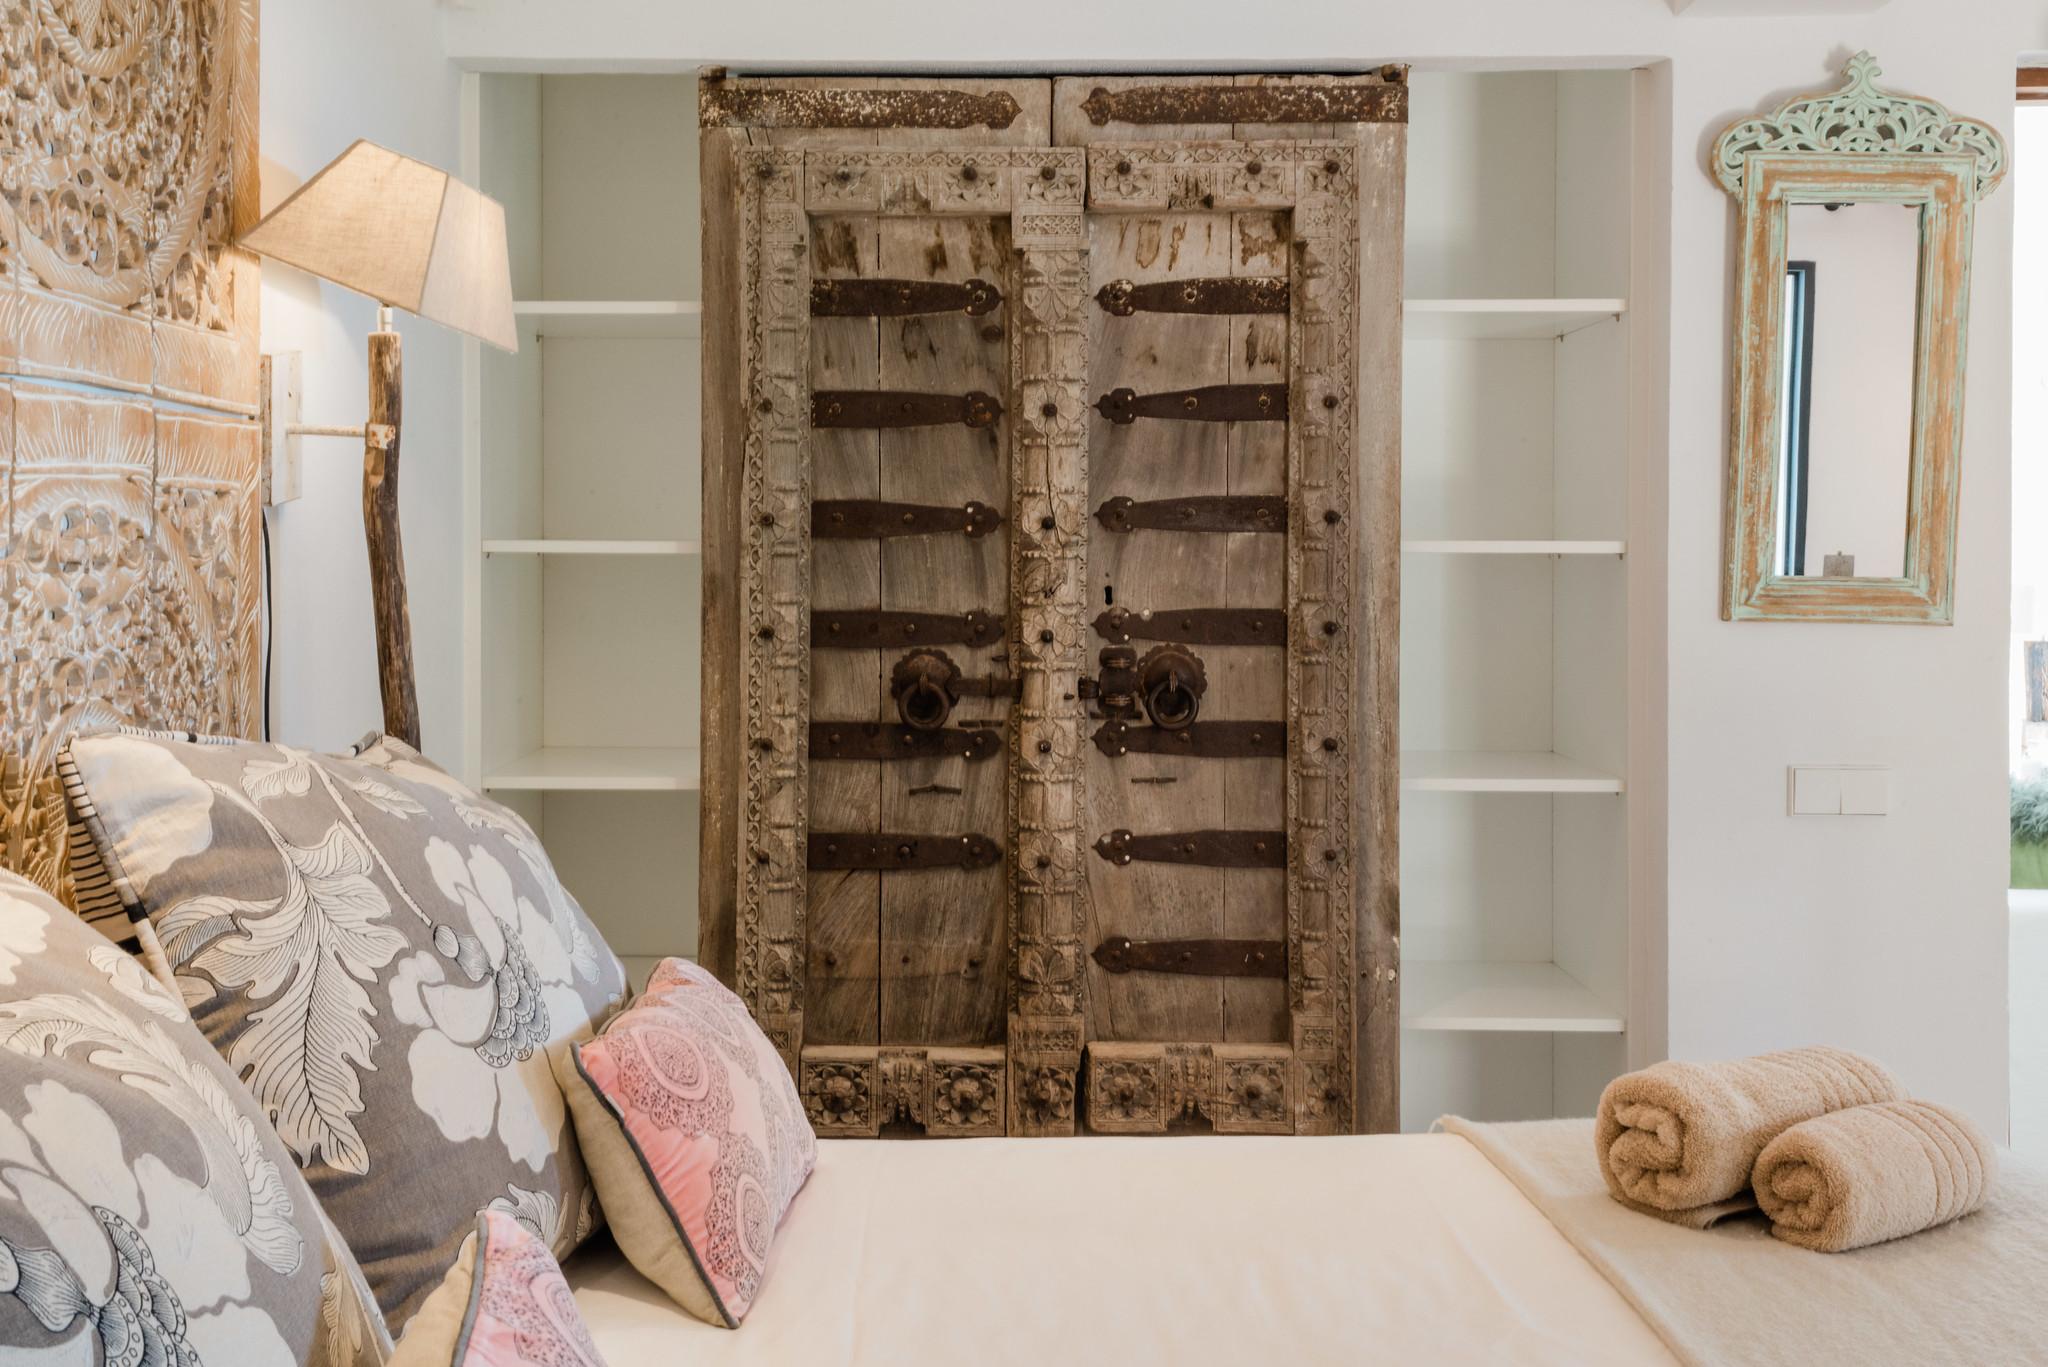 https://www.white-ibiza.com/wp-content/uploads/2020/05/white-ibiza-villas-casa-amalia-interior-bedroom6.jpg